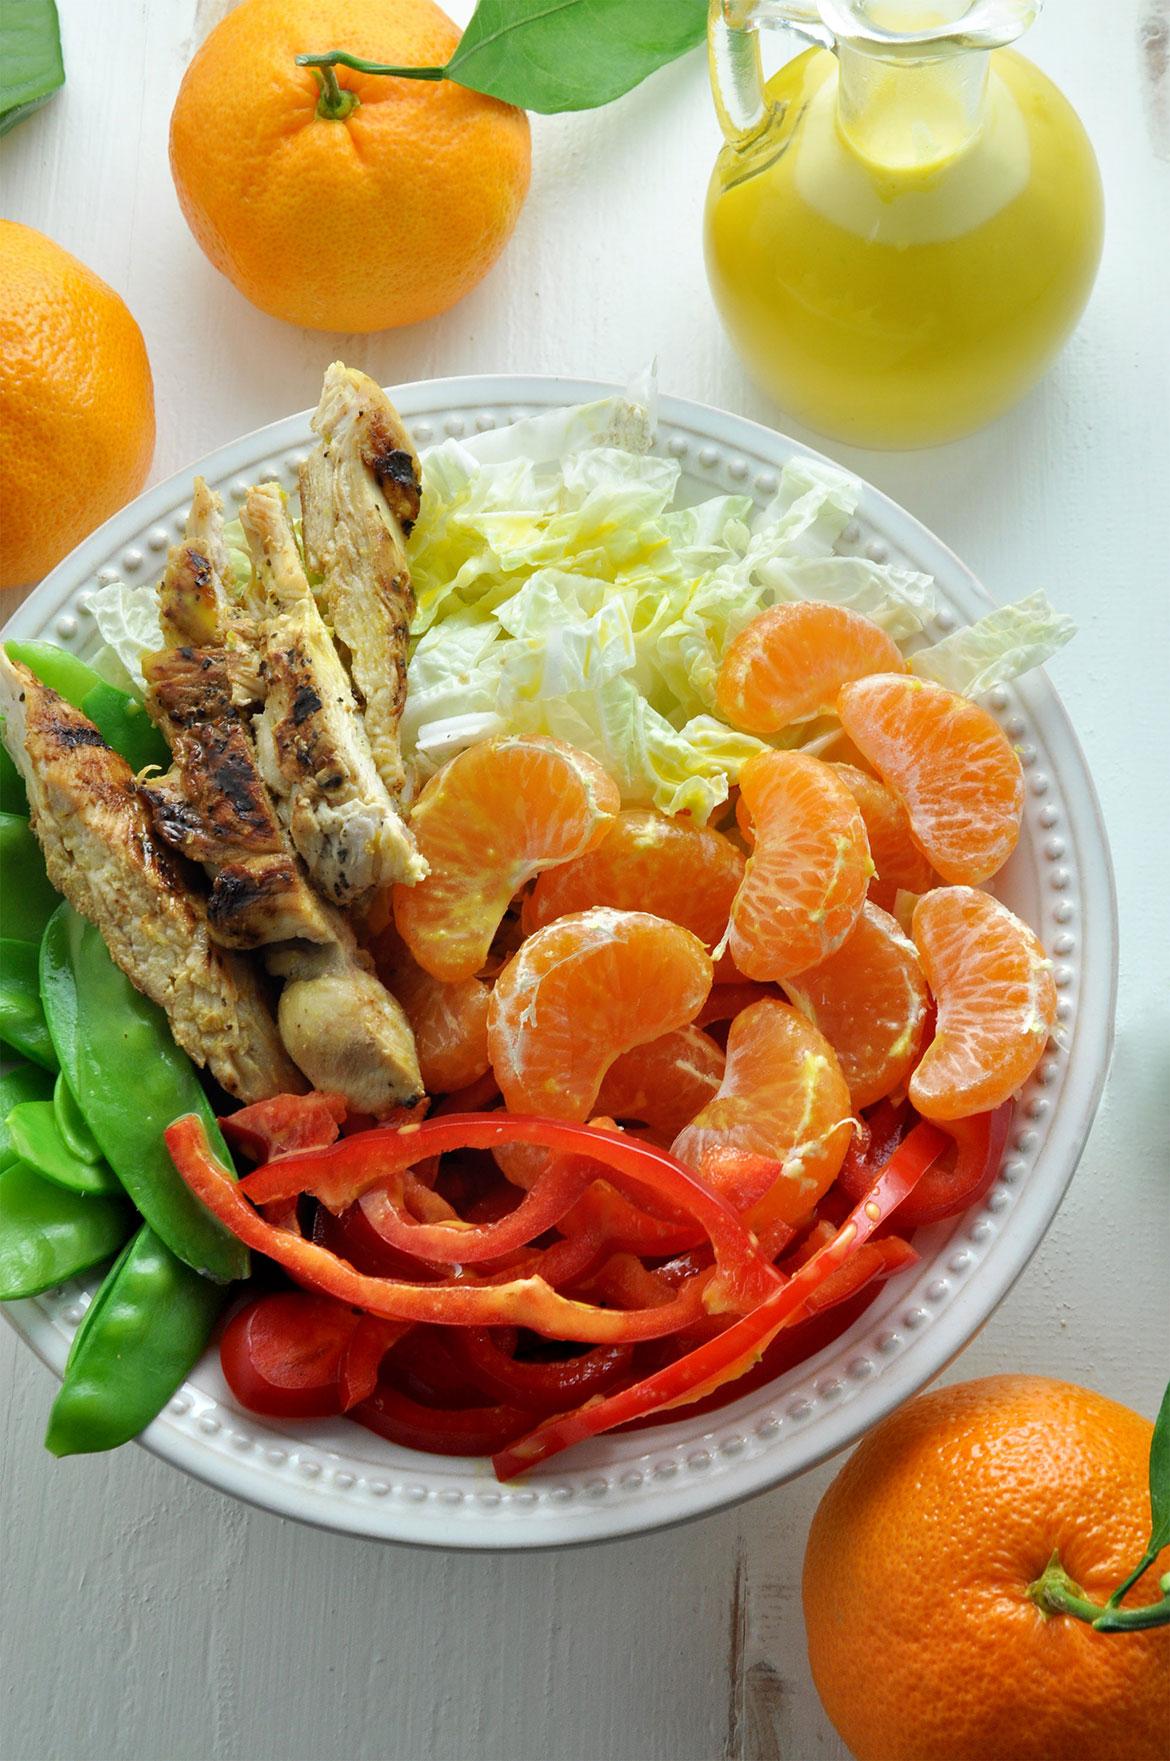 Satsuma Tangerine Chicken Salad